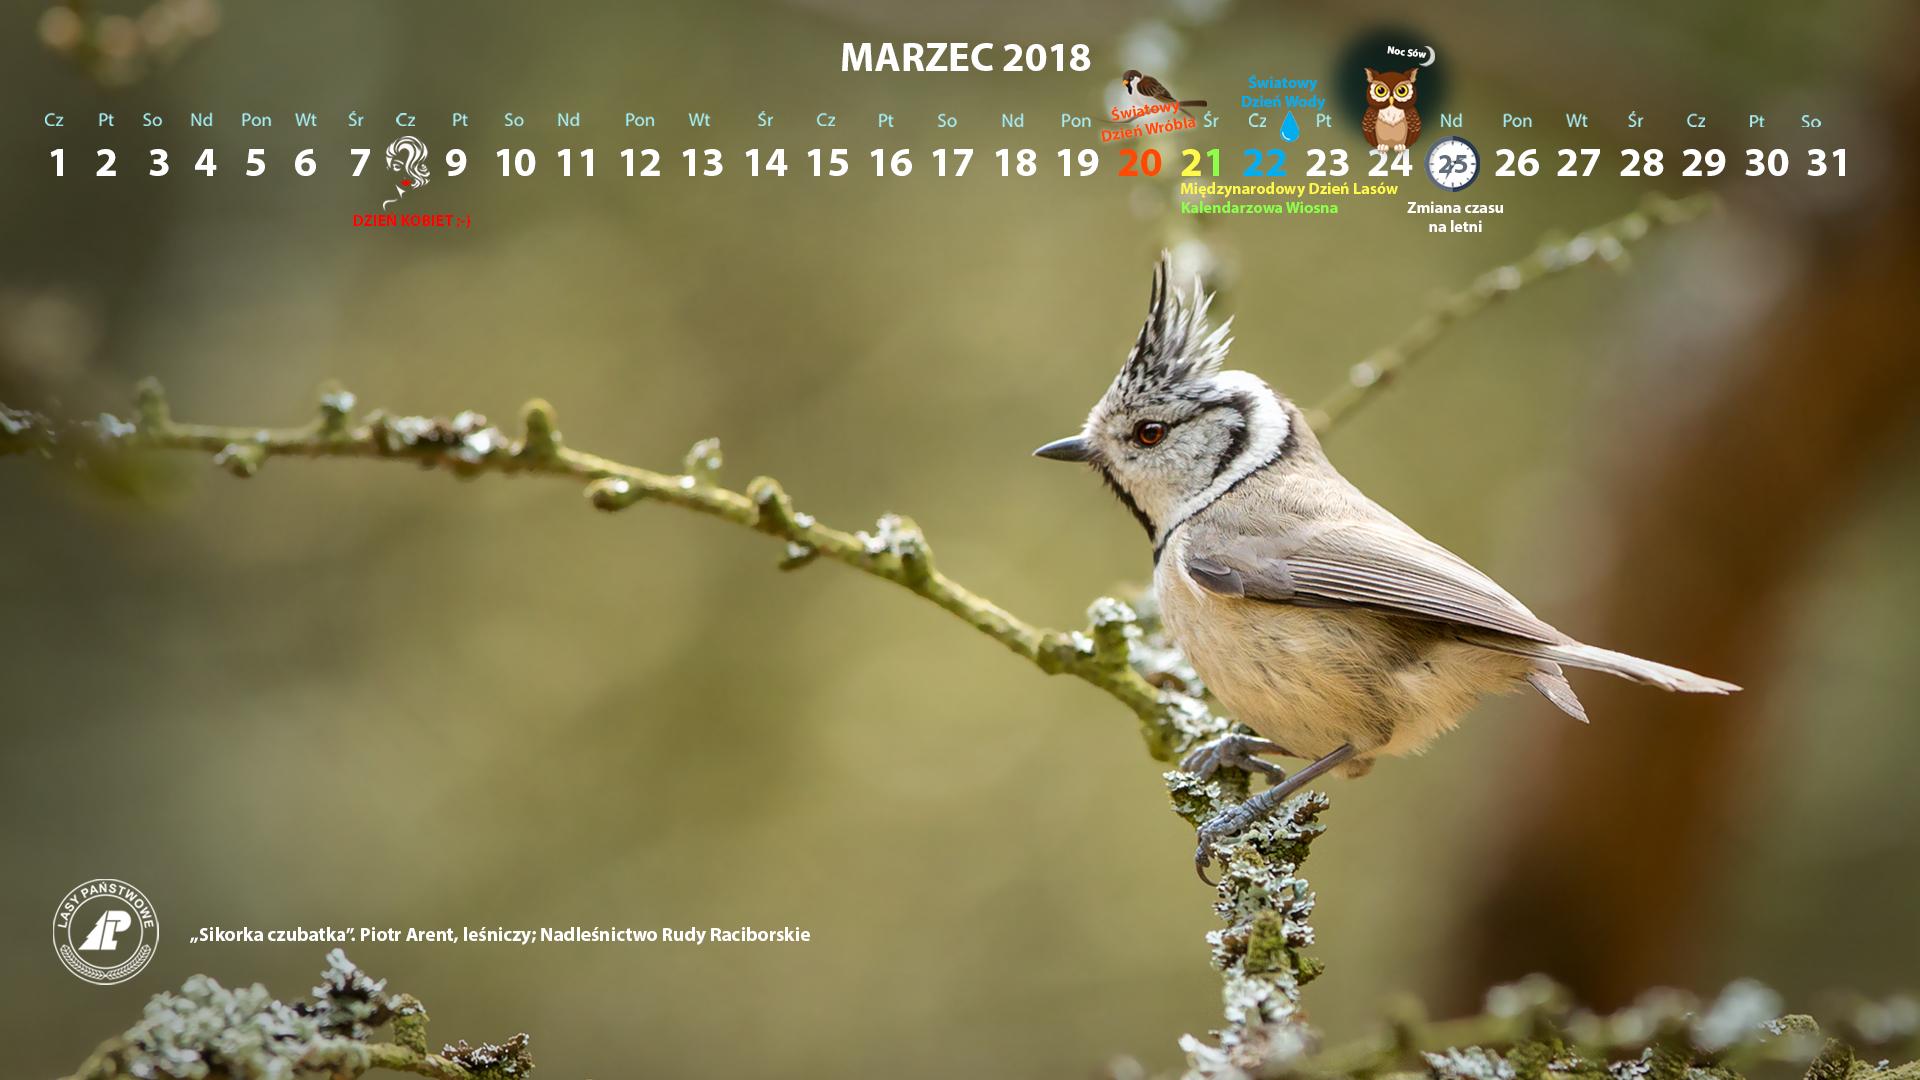 Kalendarz_MARZEC_2018_1920x1080[1].jpg